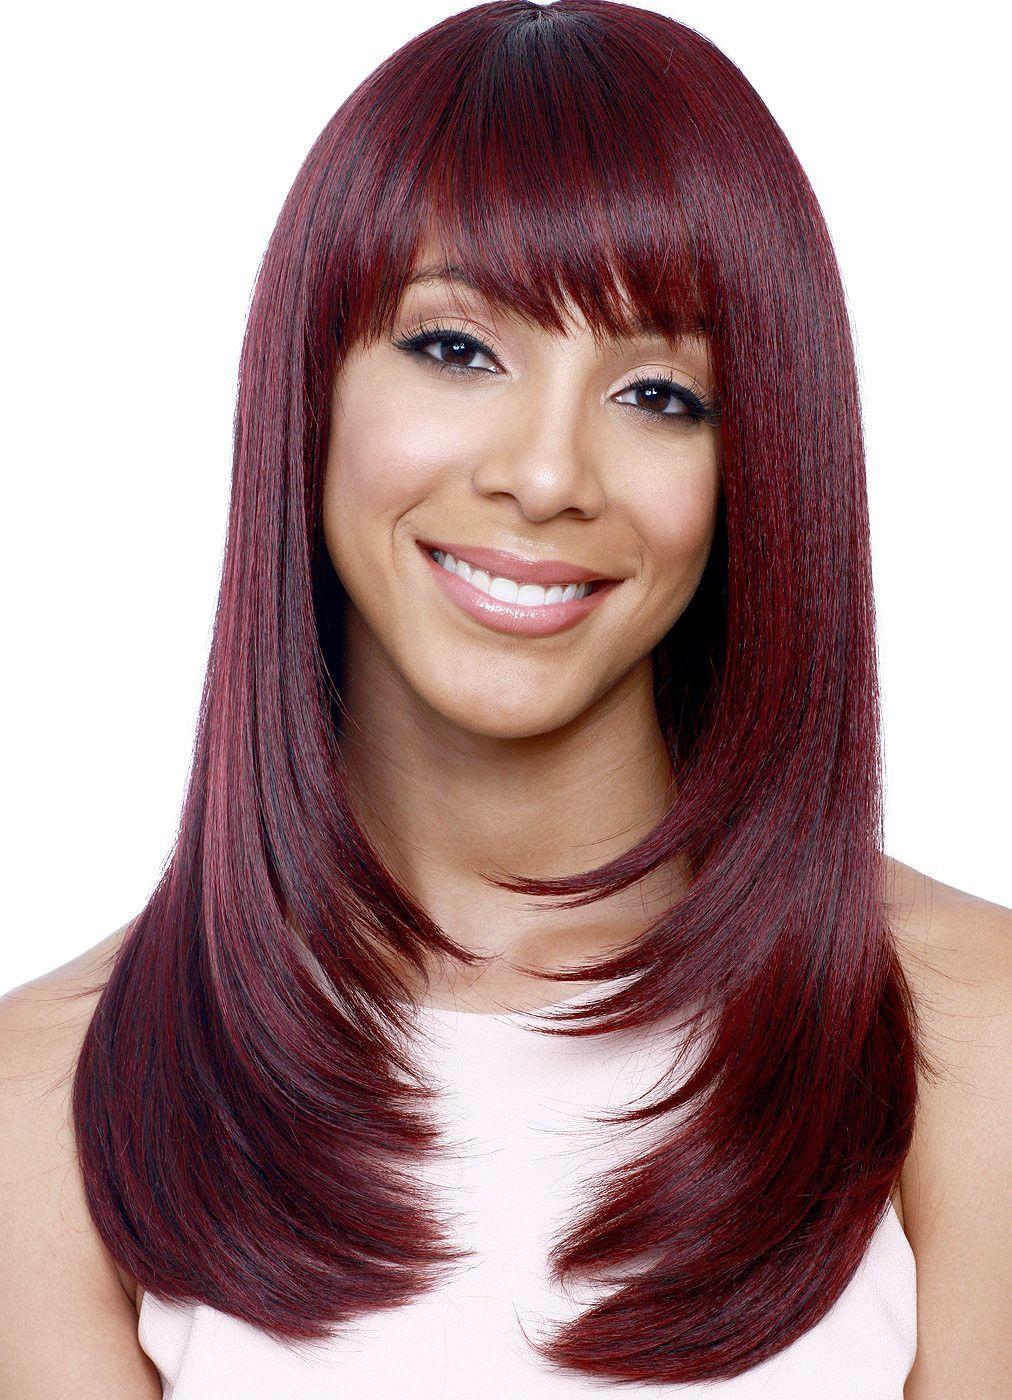 Bobbi Boss Boss Wig Synthetic Series M853 Floella Hair Wigs